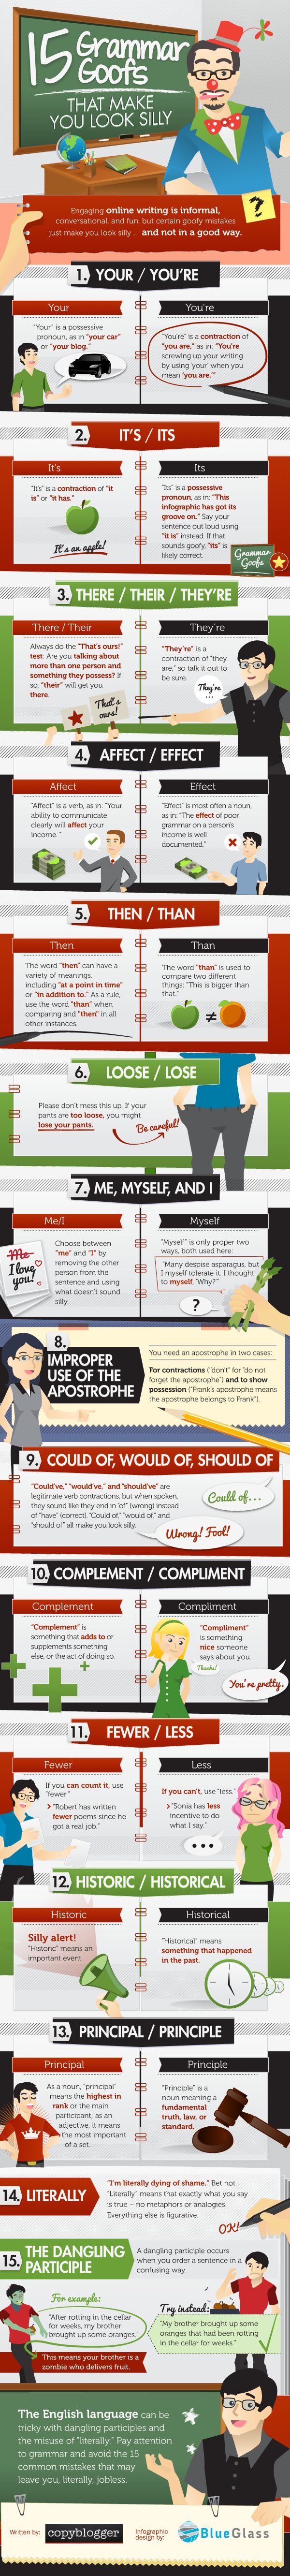 Copyblogger's Grammar Goofs Infographic